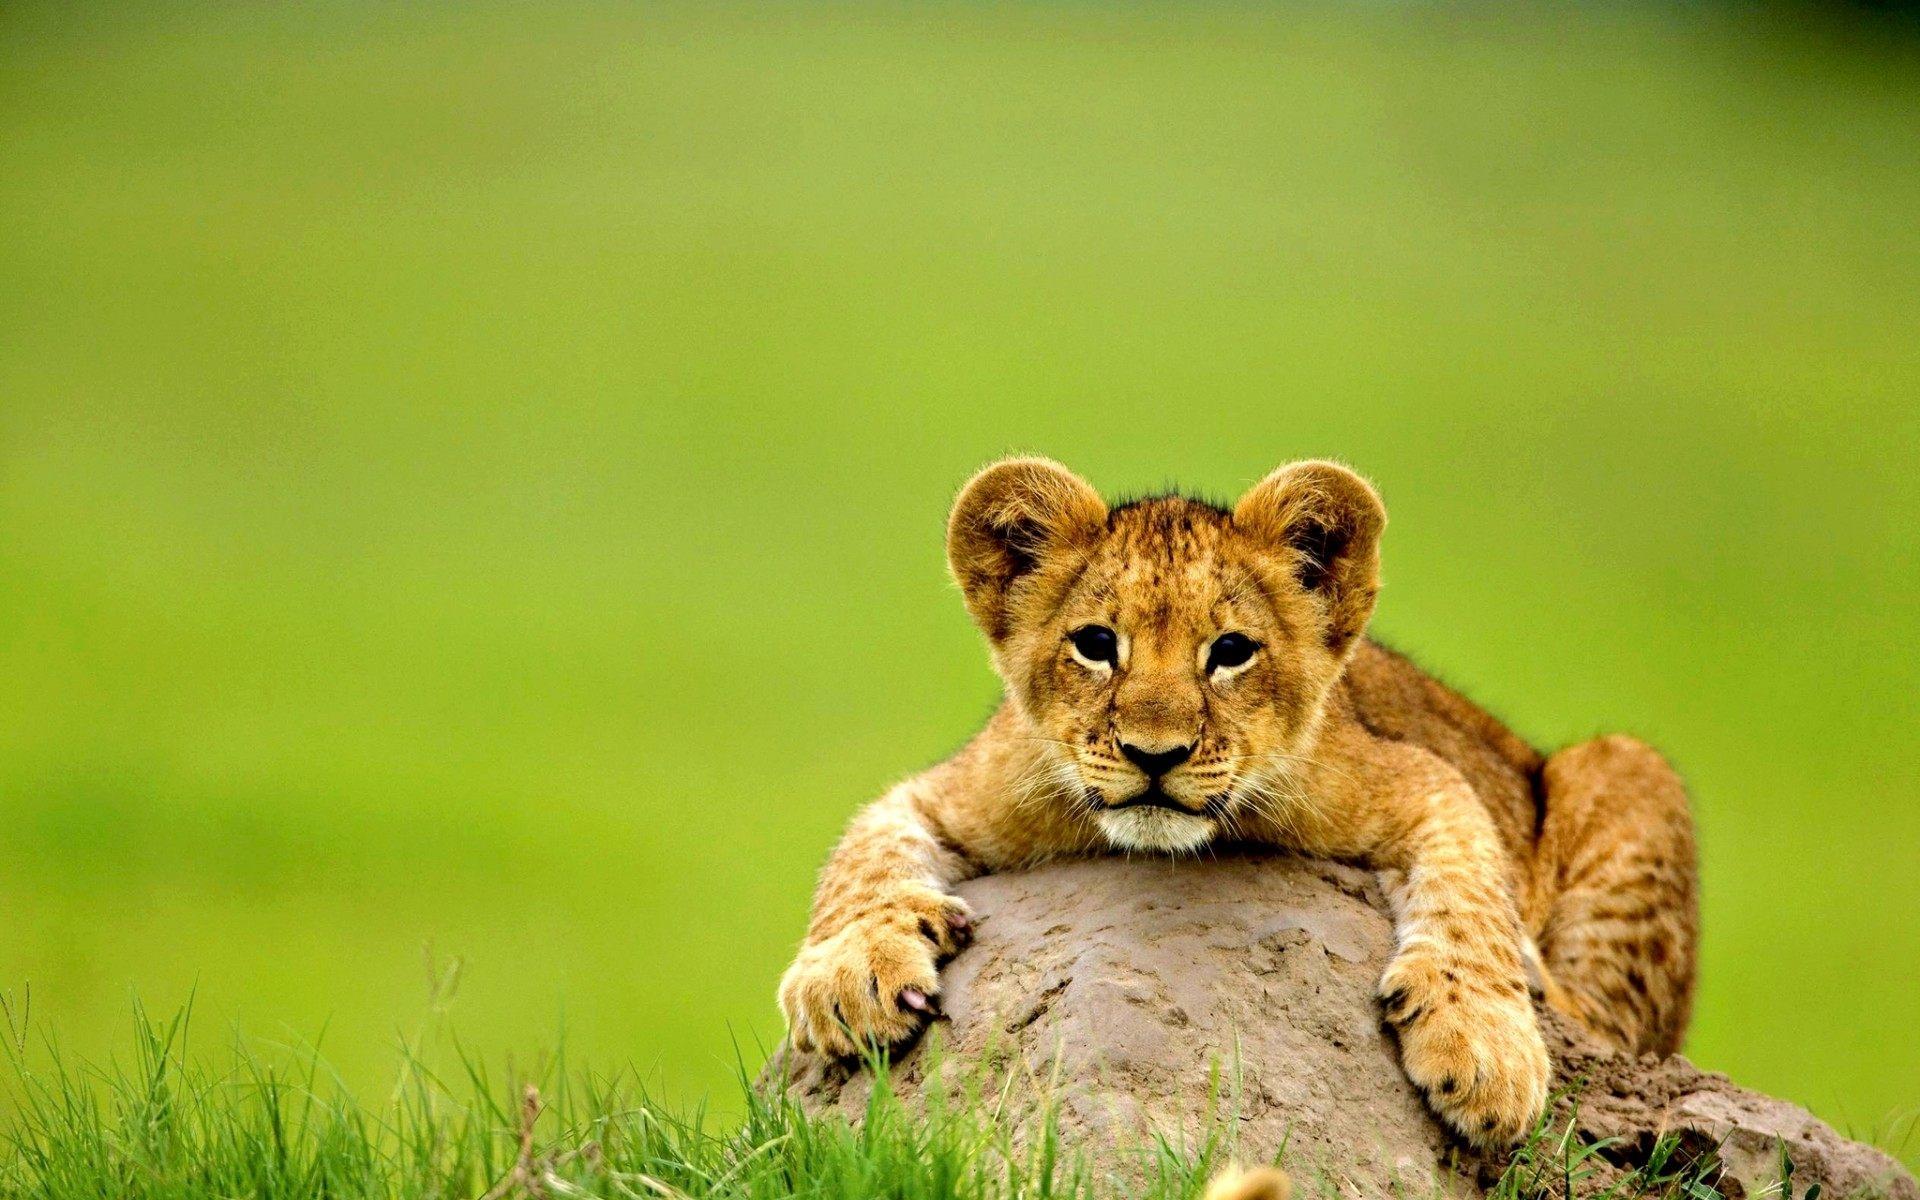 Cute lion baby animal wallpaper HD Wallpapers Rocks